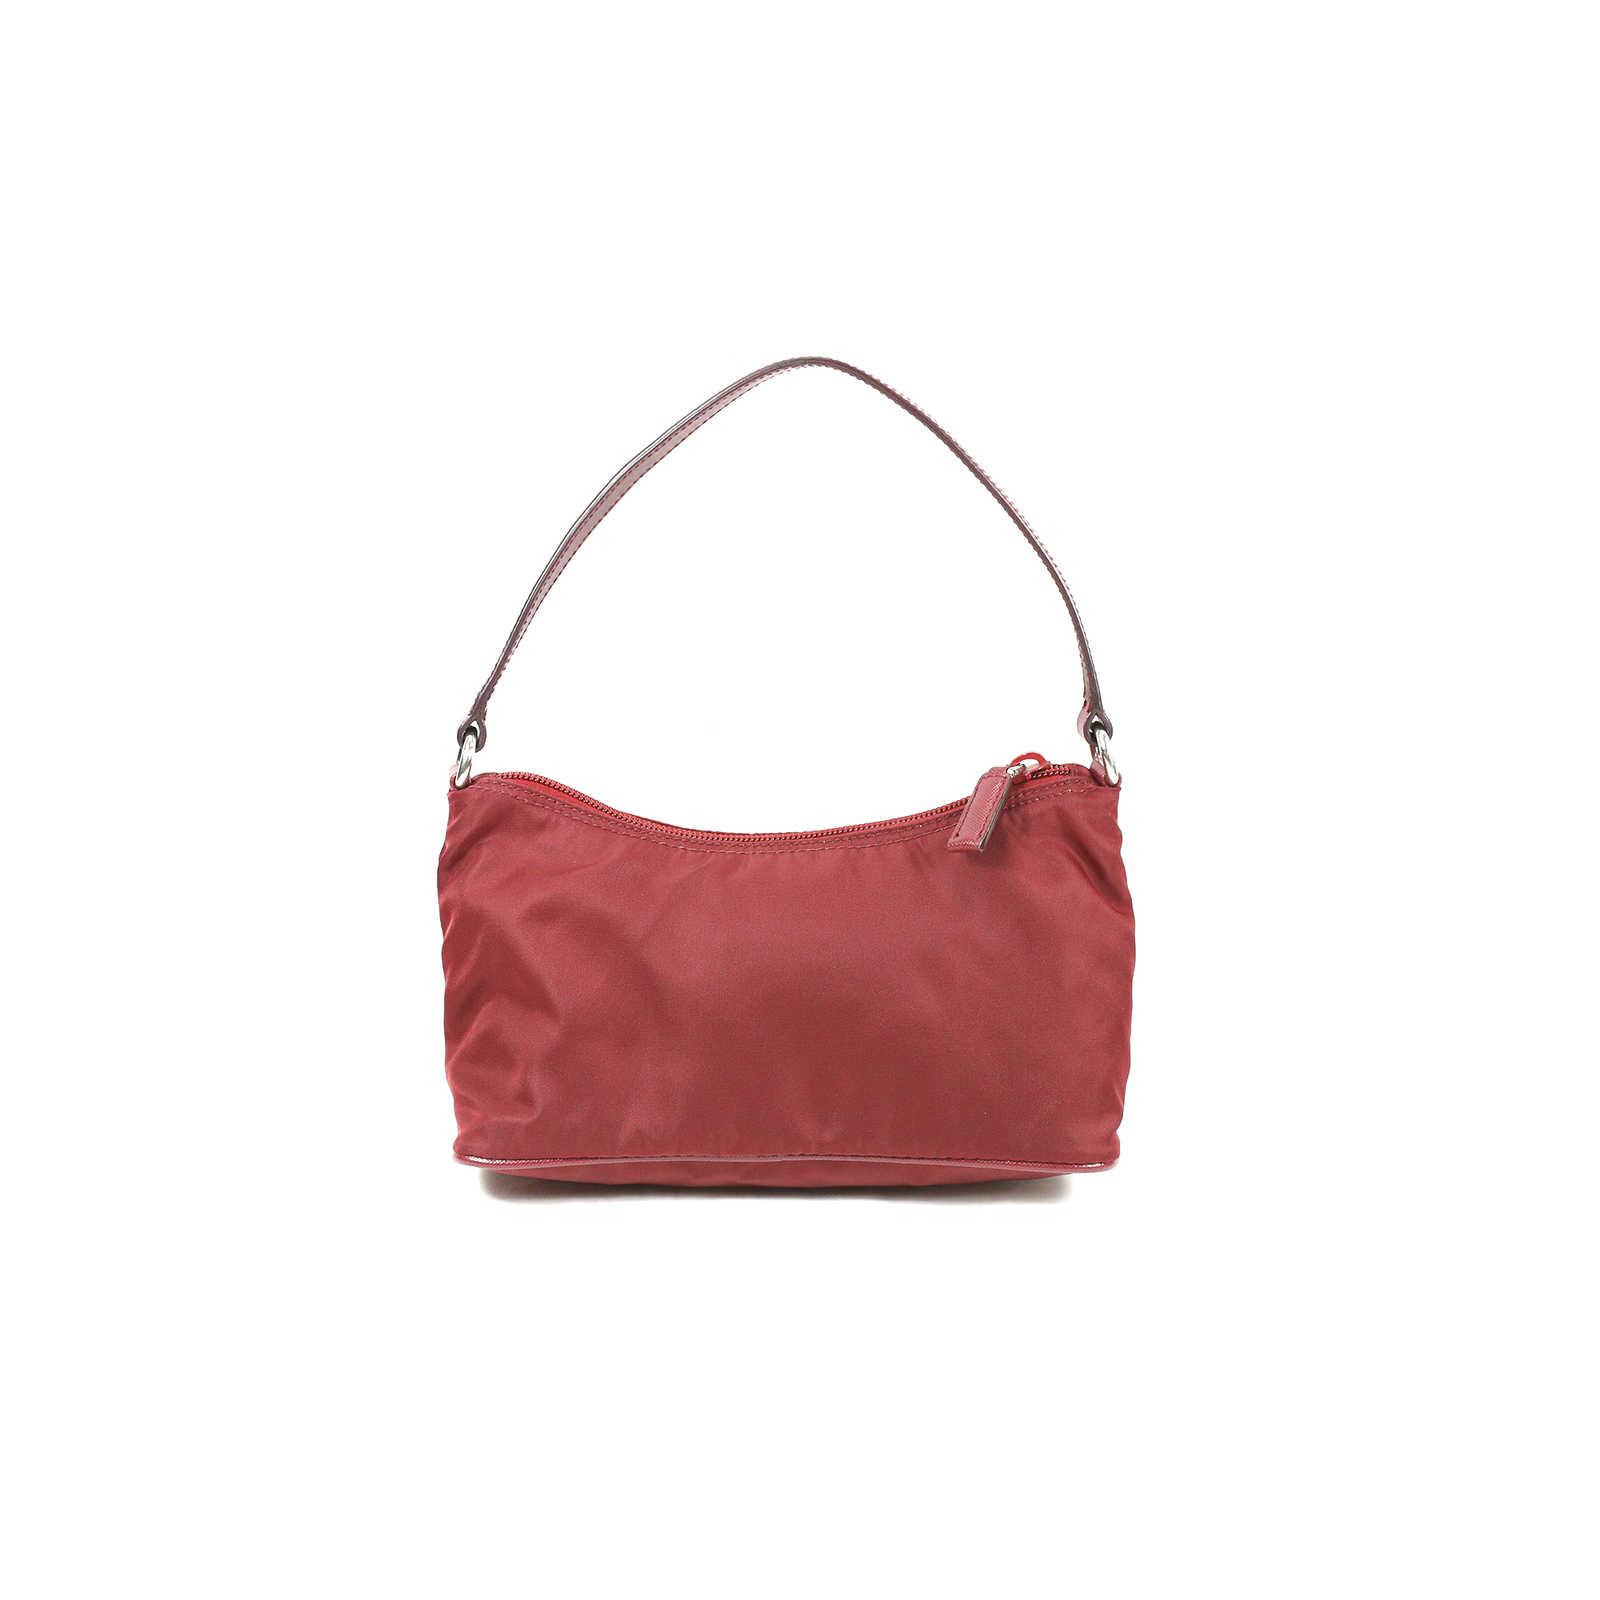 a6e445bd43d4 ... Authentic Second Hand Prada Small Nylon Bag (PSS-001-00011) - Thumbnail  ...